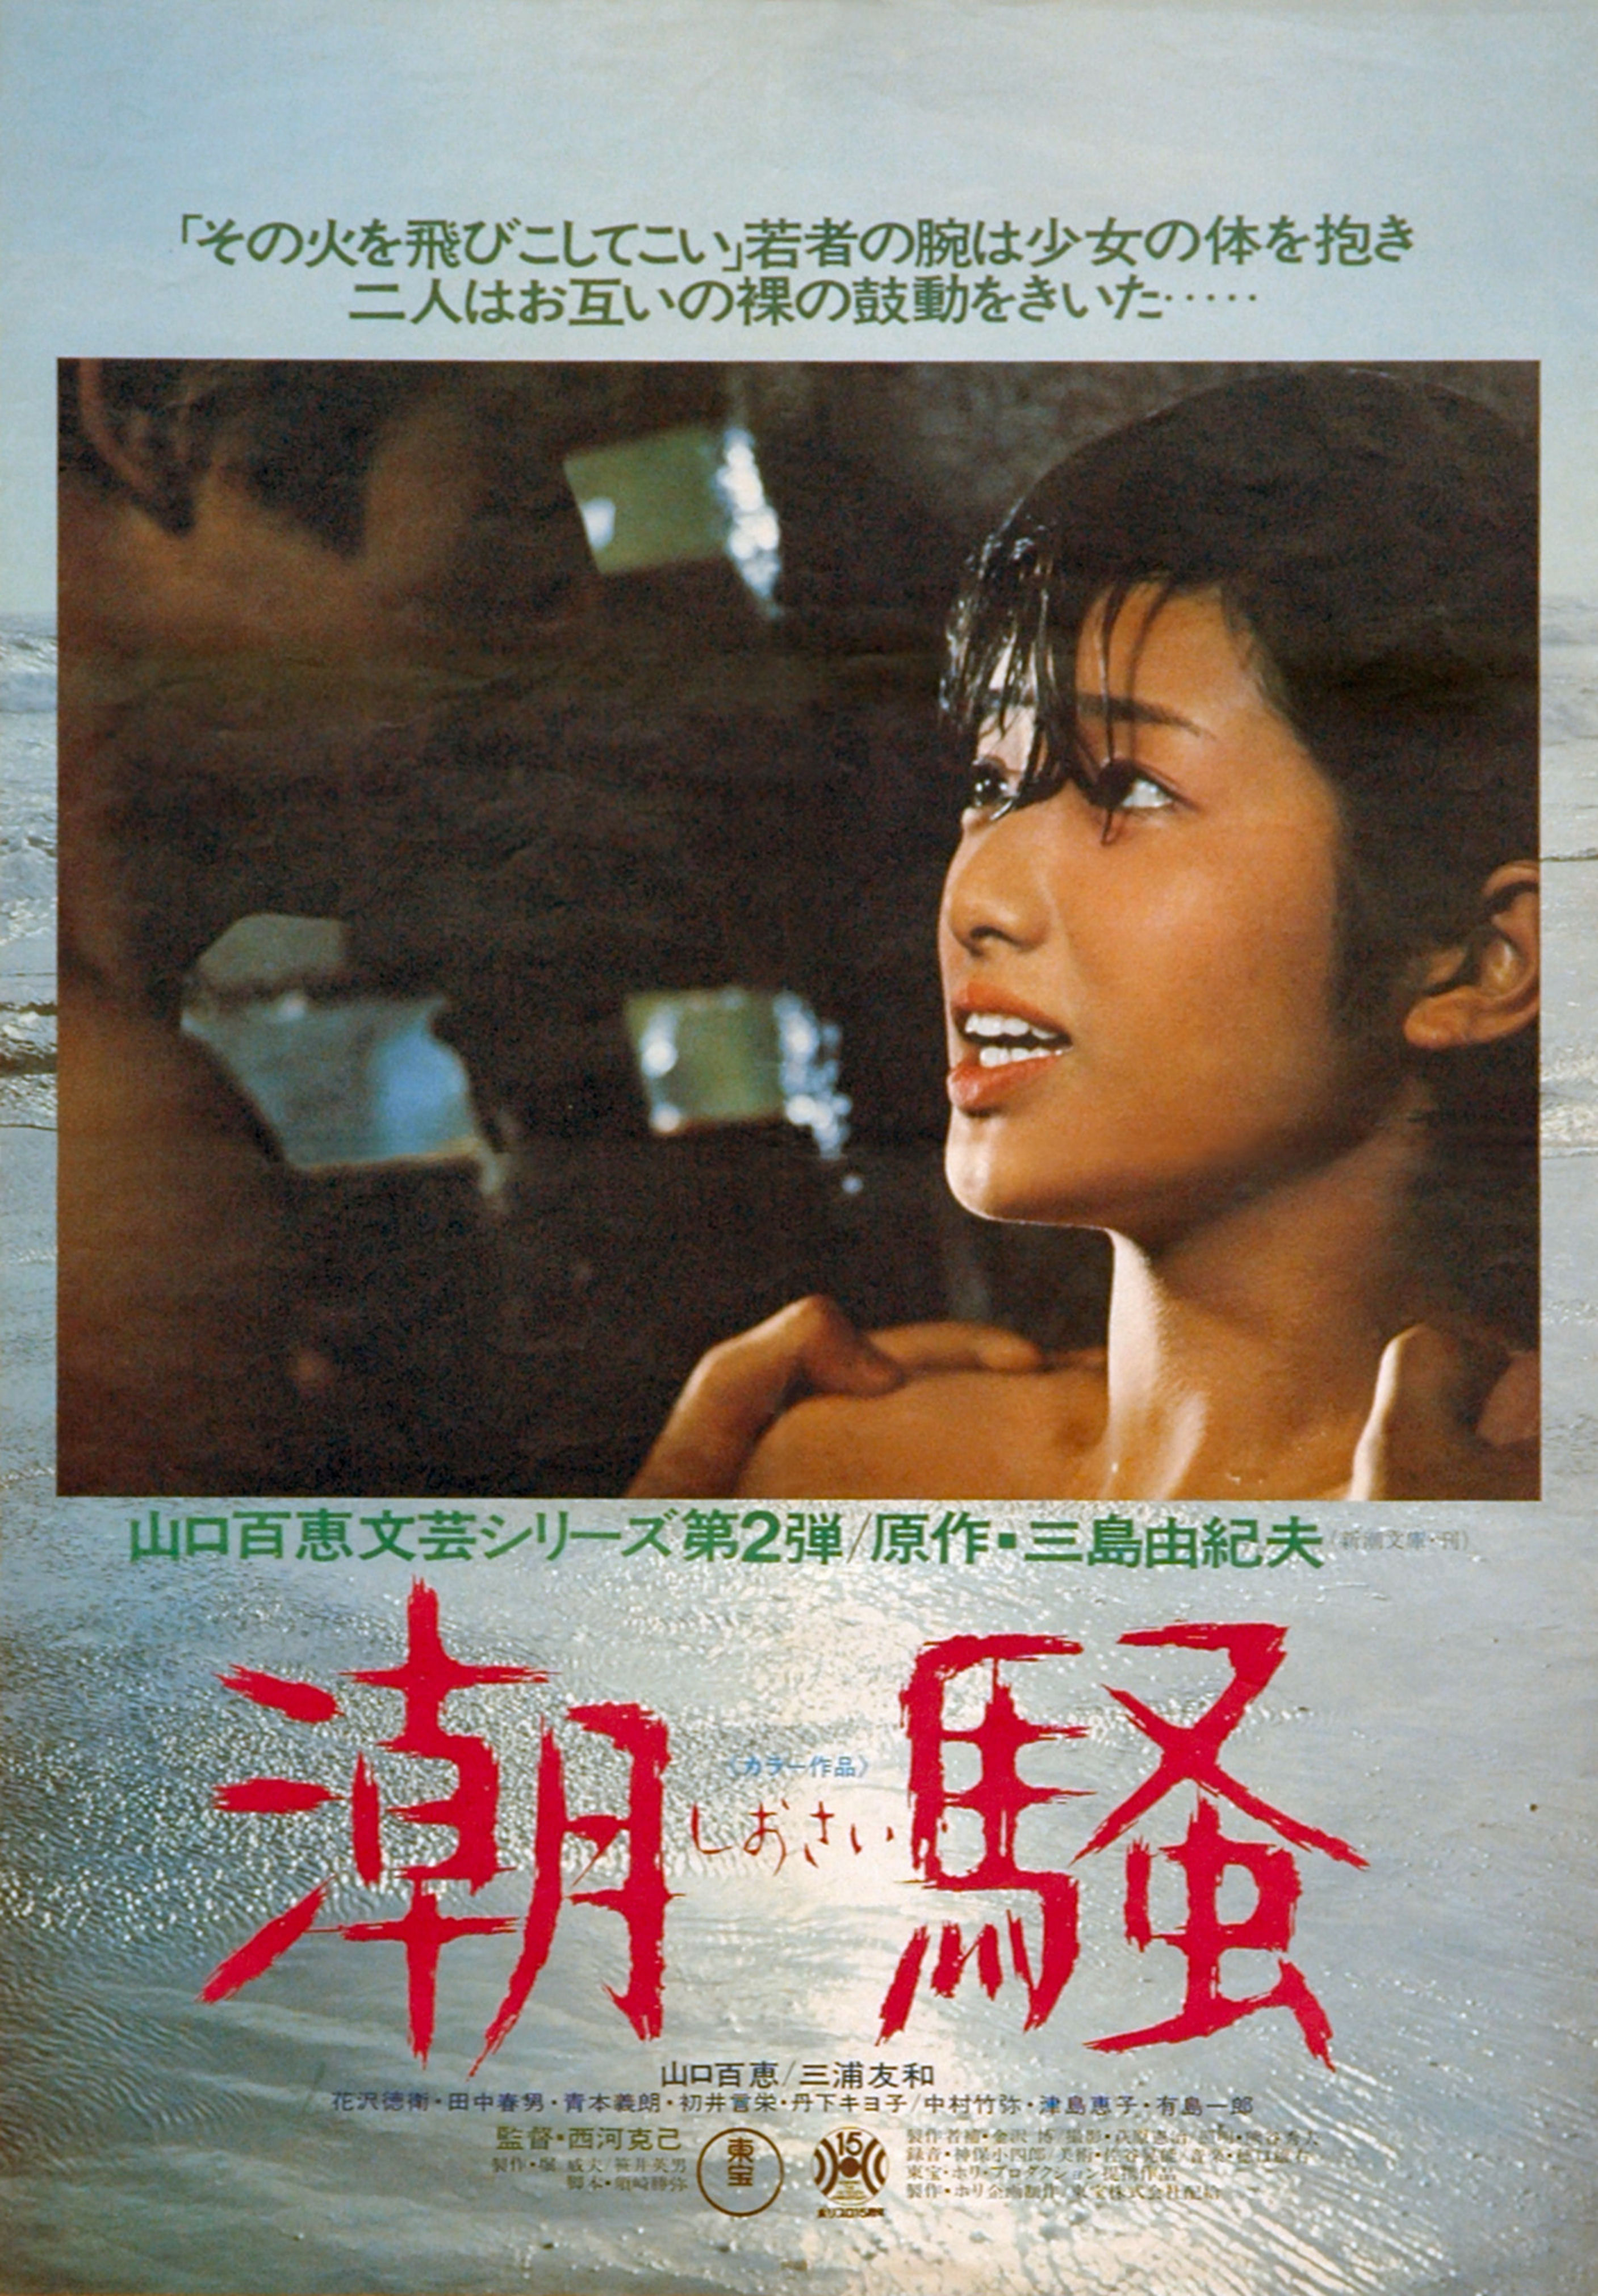 Yukio Mishima - Le tumulte des flots